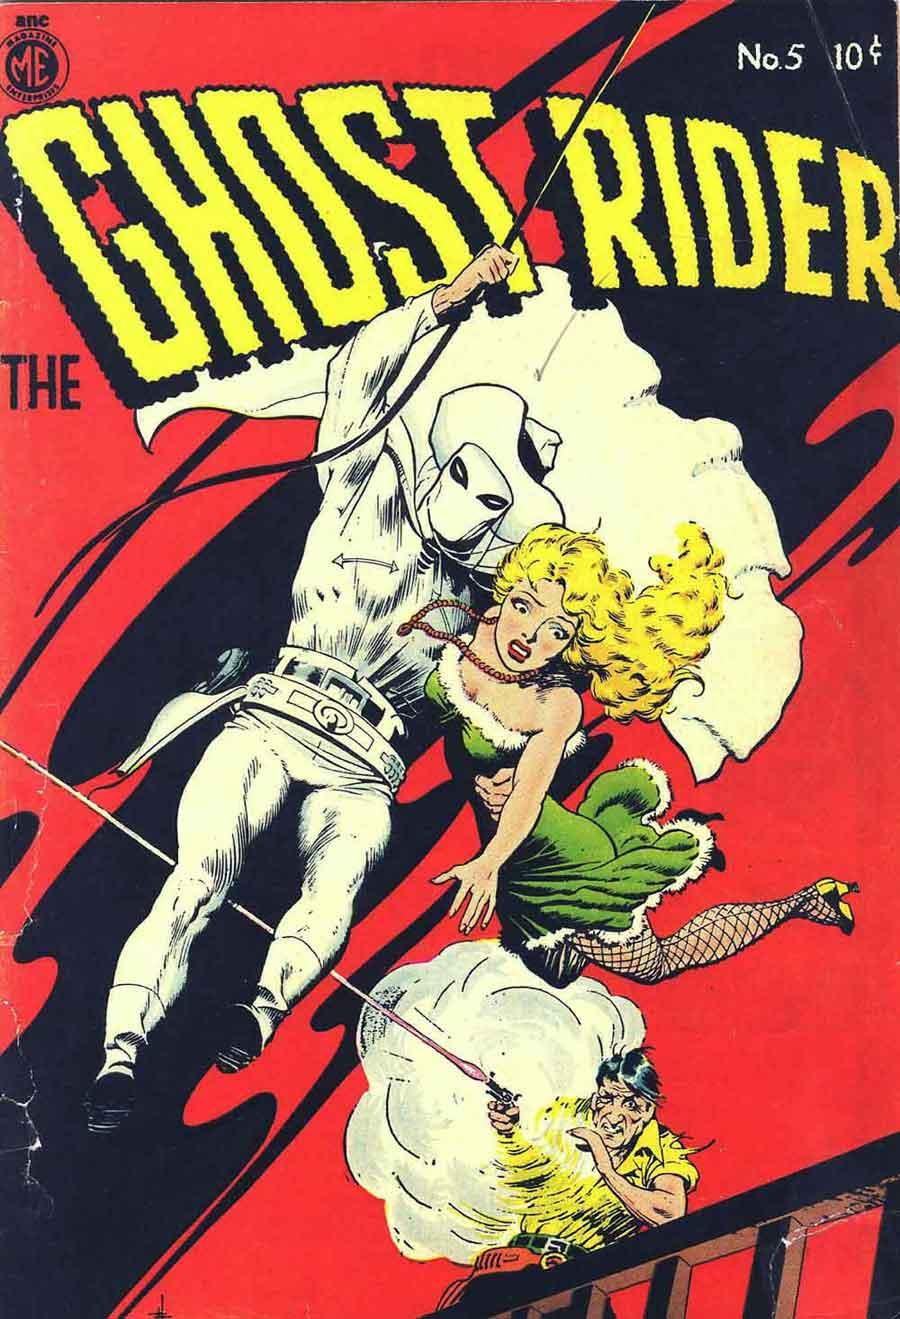 Ghost Rider v1 #5 comic book cover art by Frank Frazetta